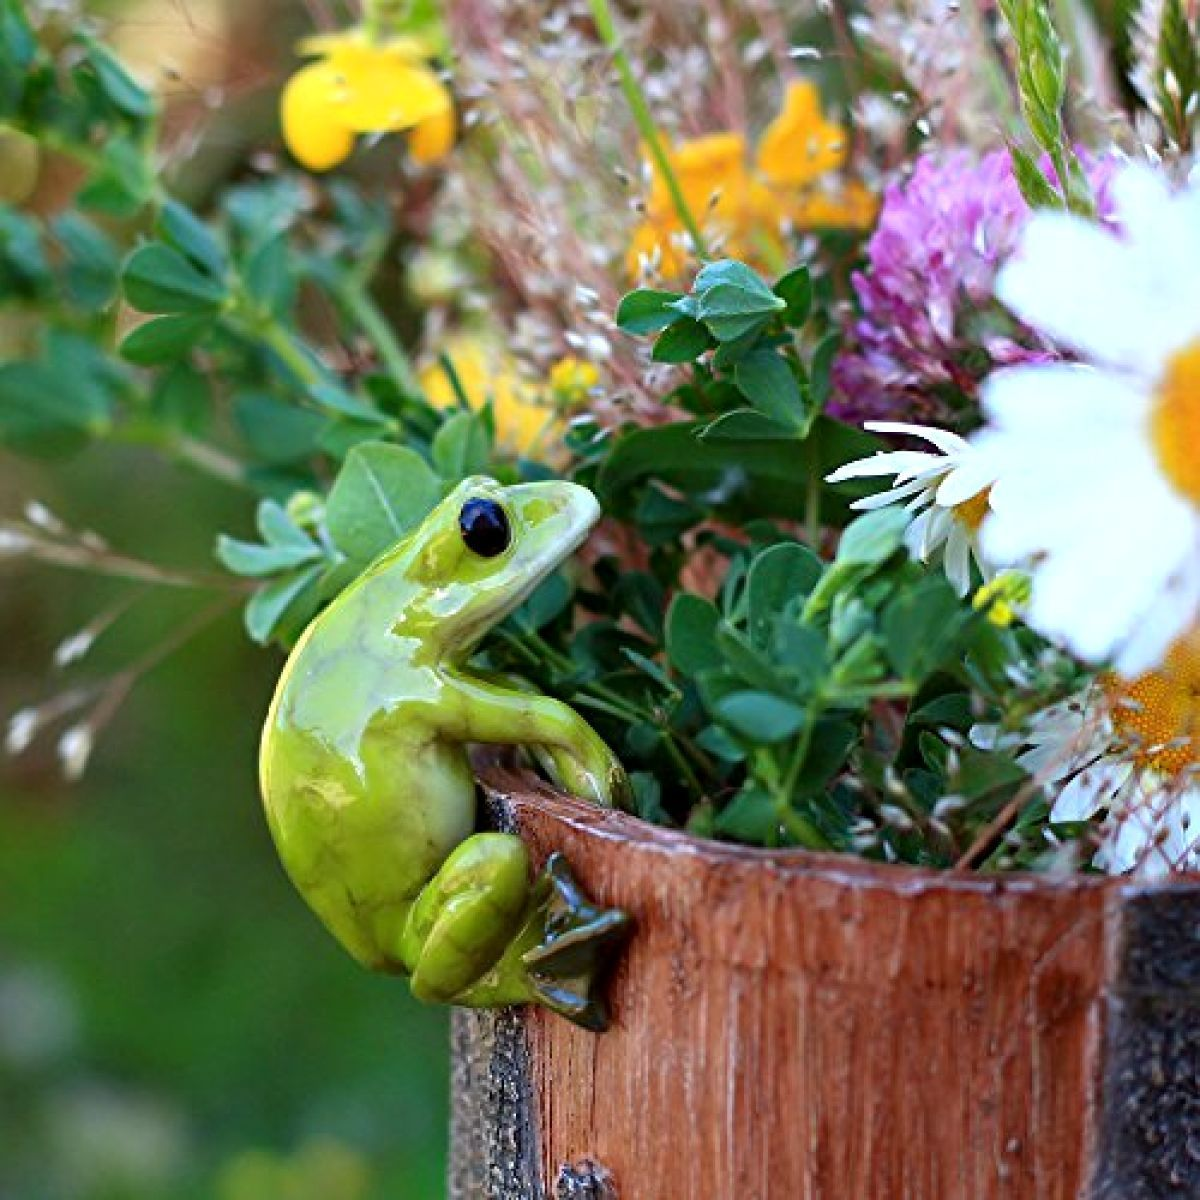 Top Collection Miniature Fairy Garden and Terrarium Frog Flower Pot and Vase Hug